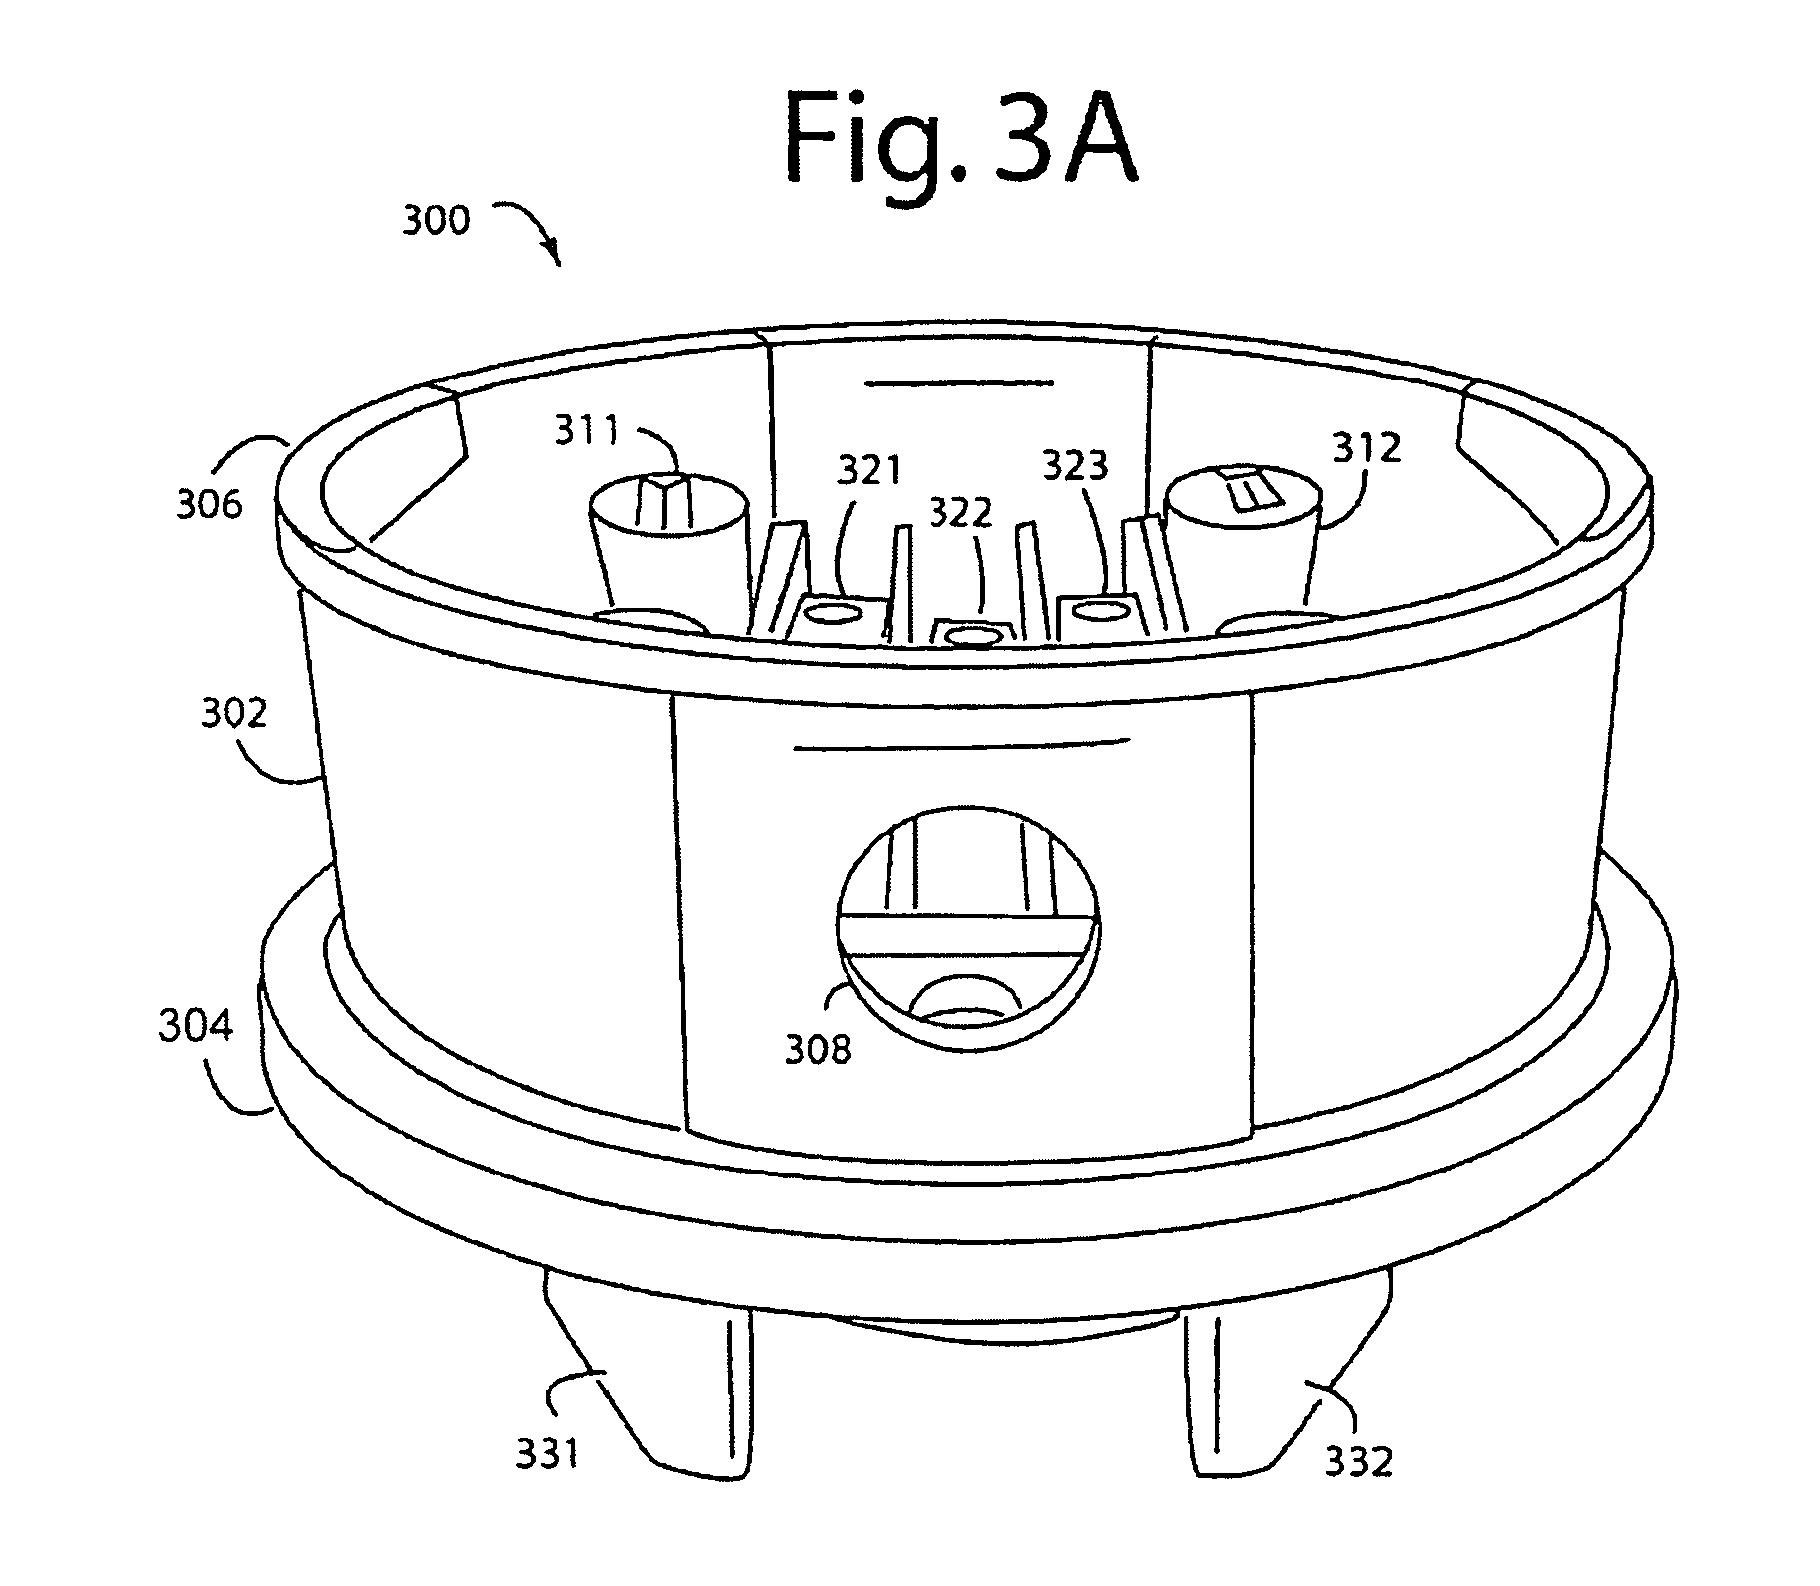 7 jaw meter socket wiring diagram soil profile of michigan patent us7648389 supply side backfeed